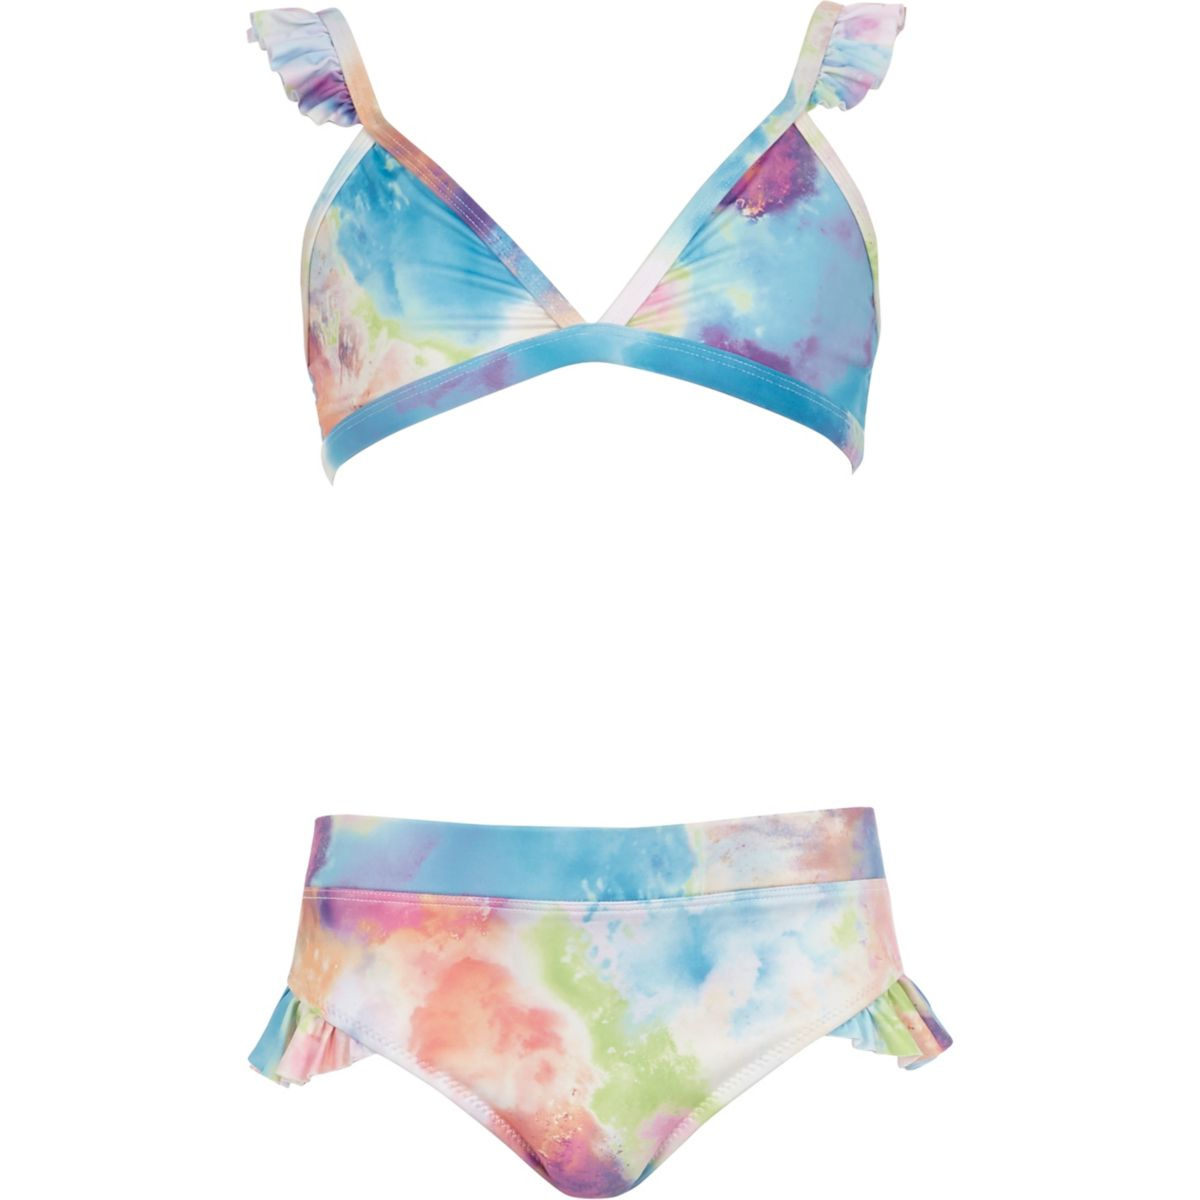 Triangel-Bikini mit Farbfleckenmuster